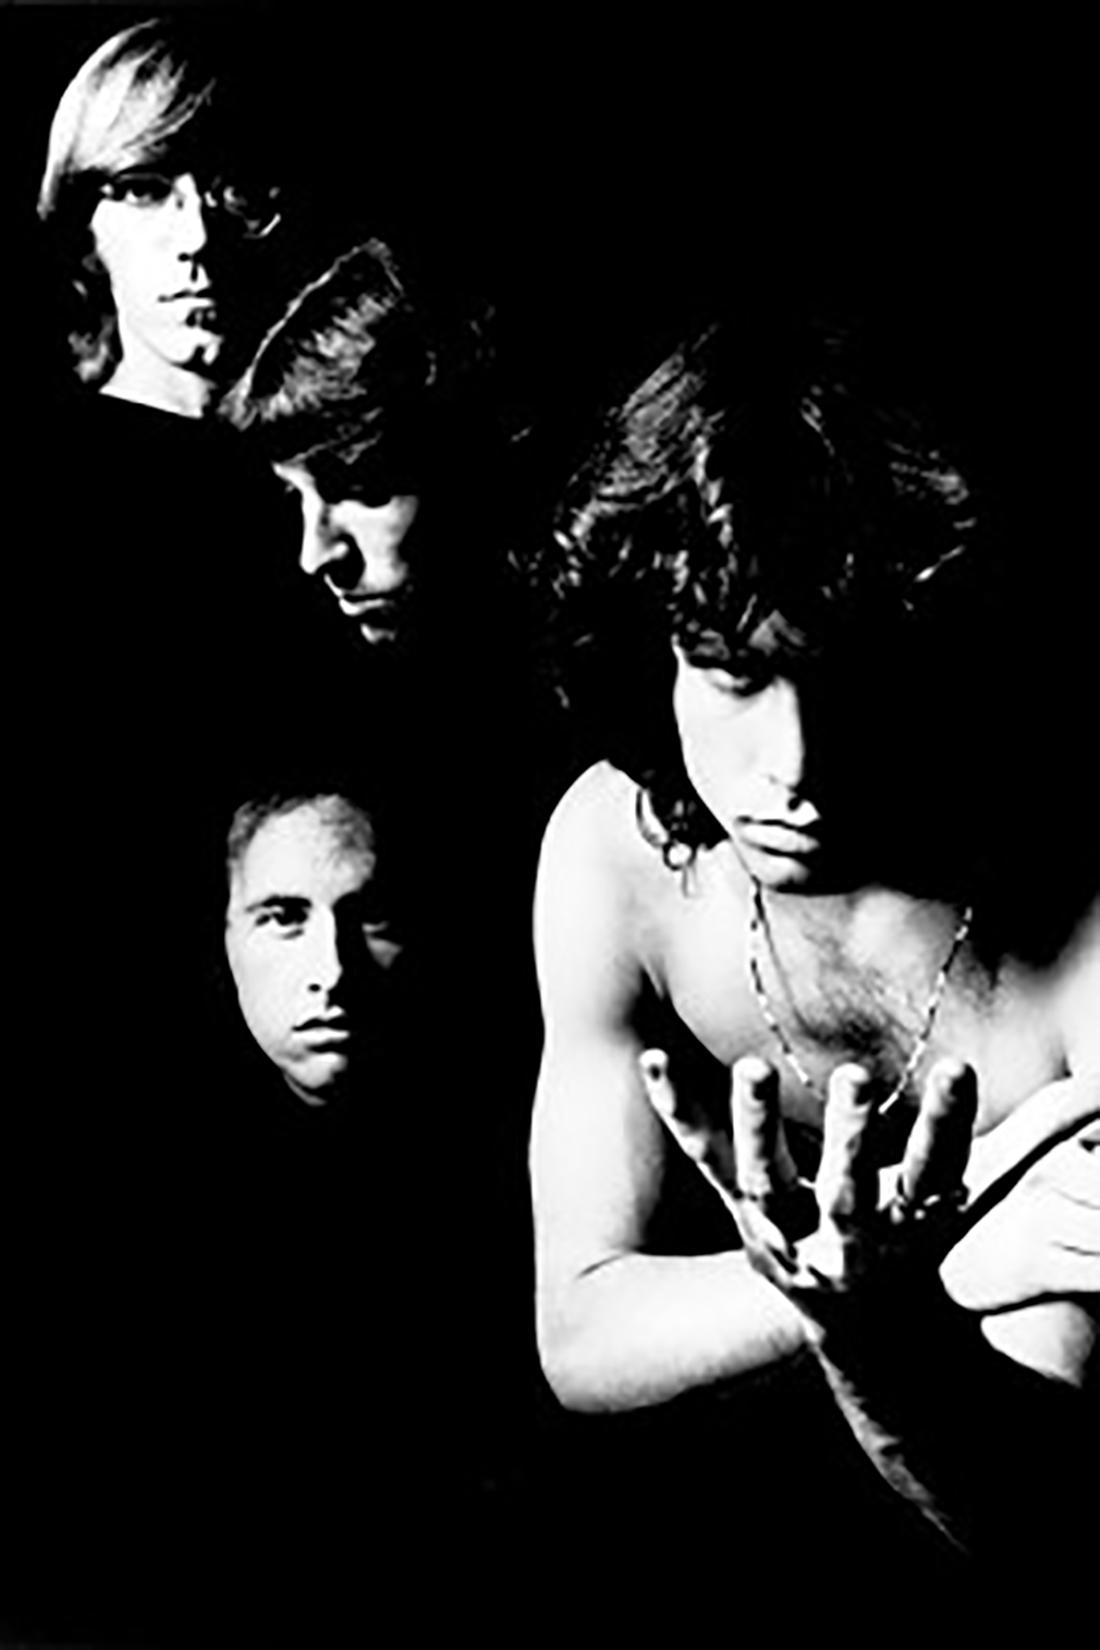 UNSPECIFIED - JANUARY 01:  Photo of DOORS; studio, posed - L-R: Ray Manzarek, Robbie Kreiger, John Densmore, Jim Morrison  (Photo by Charlie Gillett/Redferns)